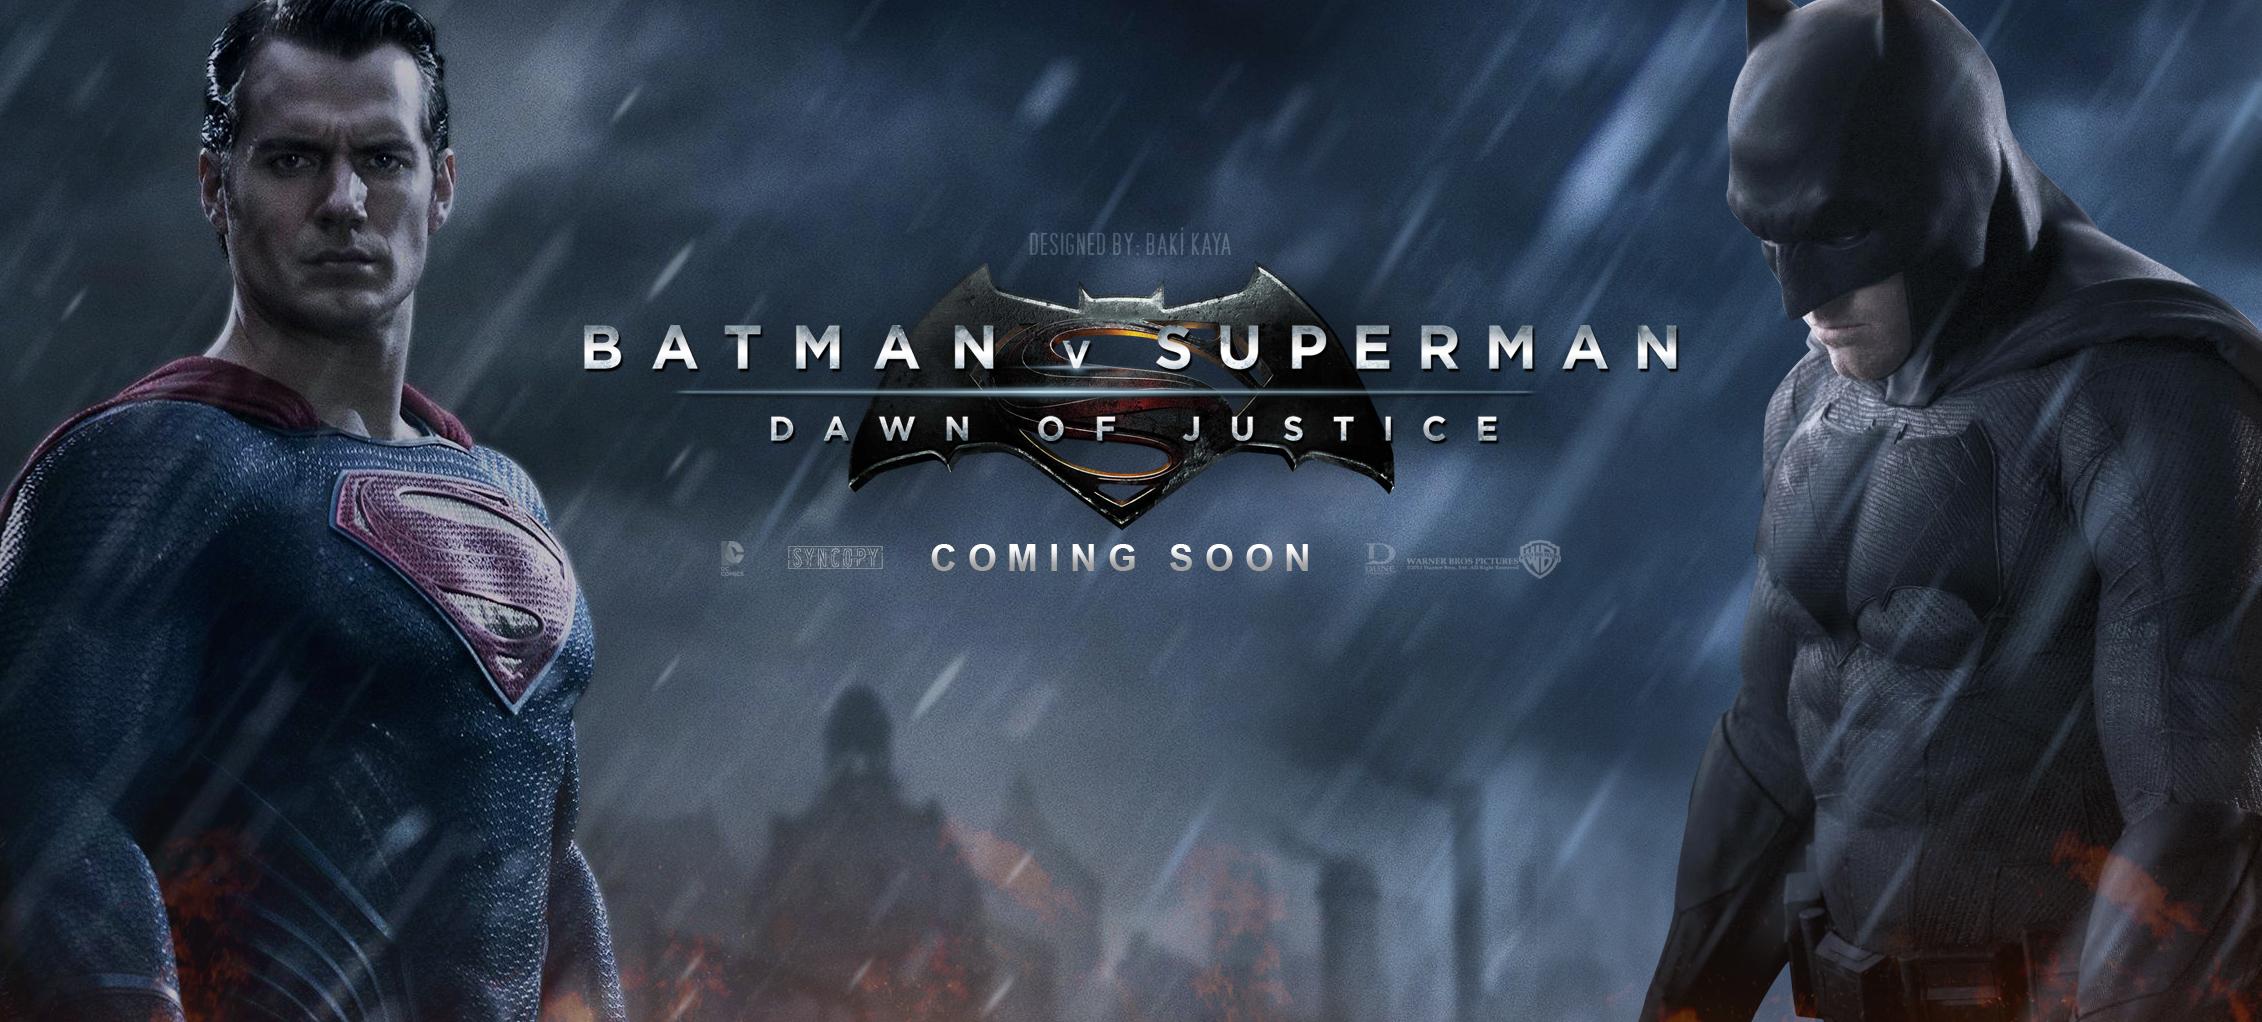 new info on batman's beginning in batman v superman — geektyrant